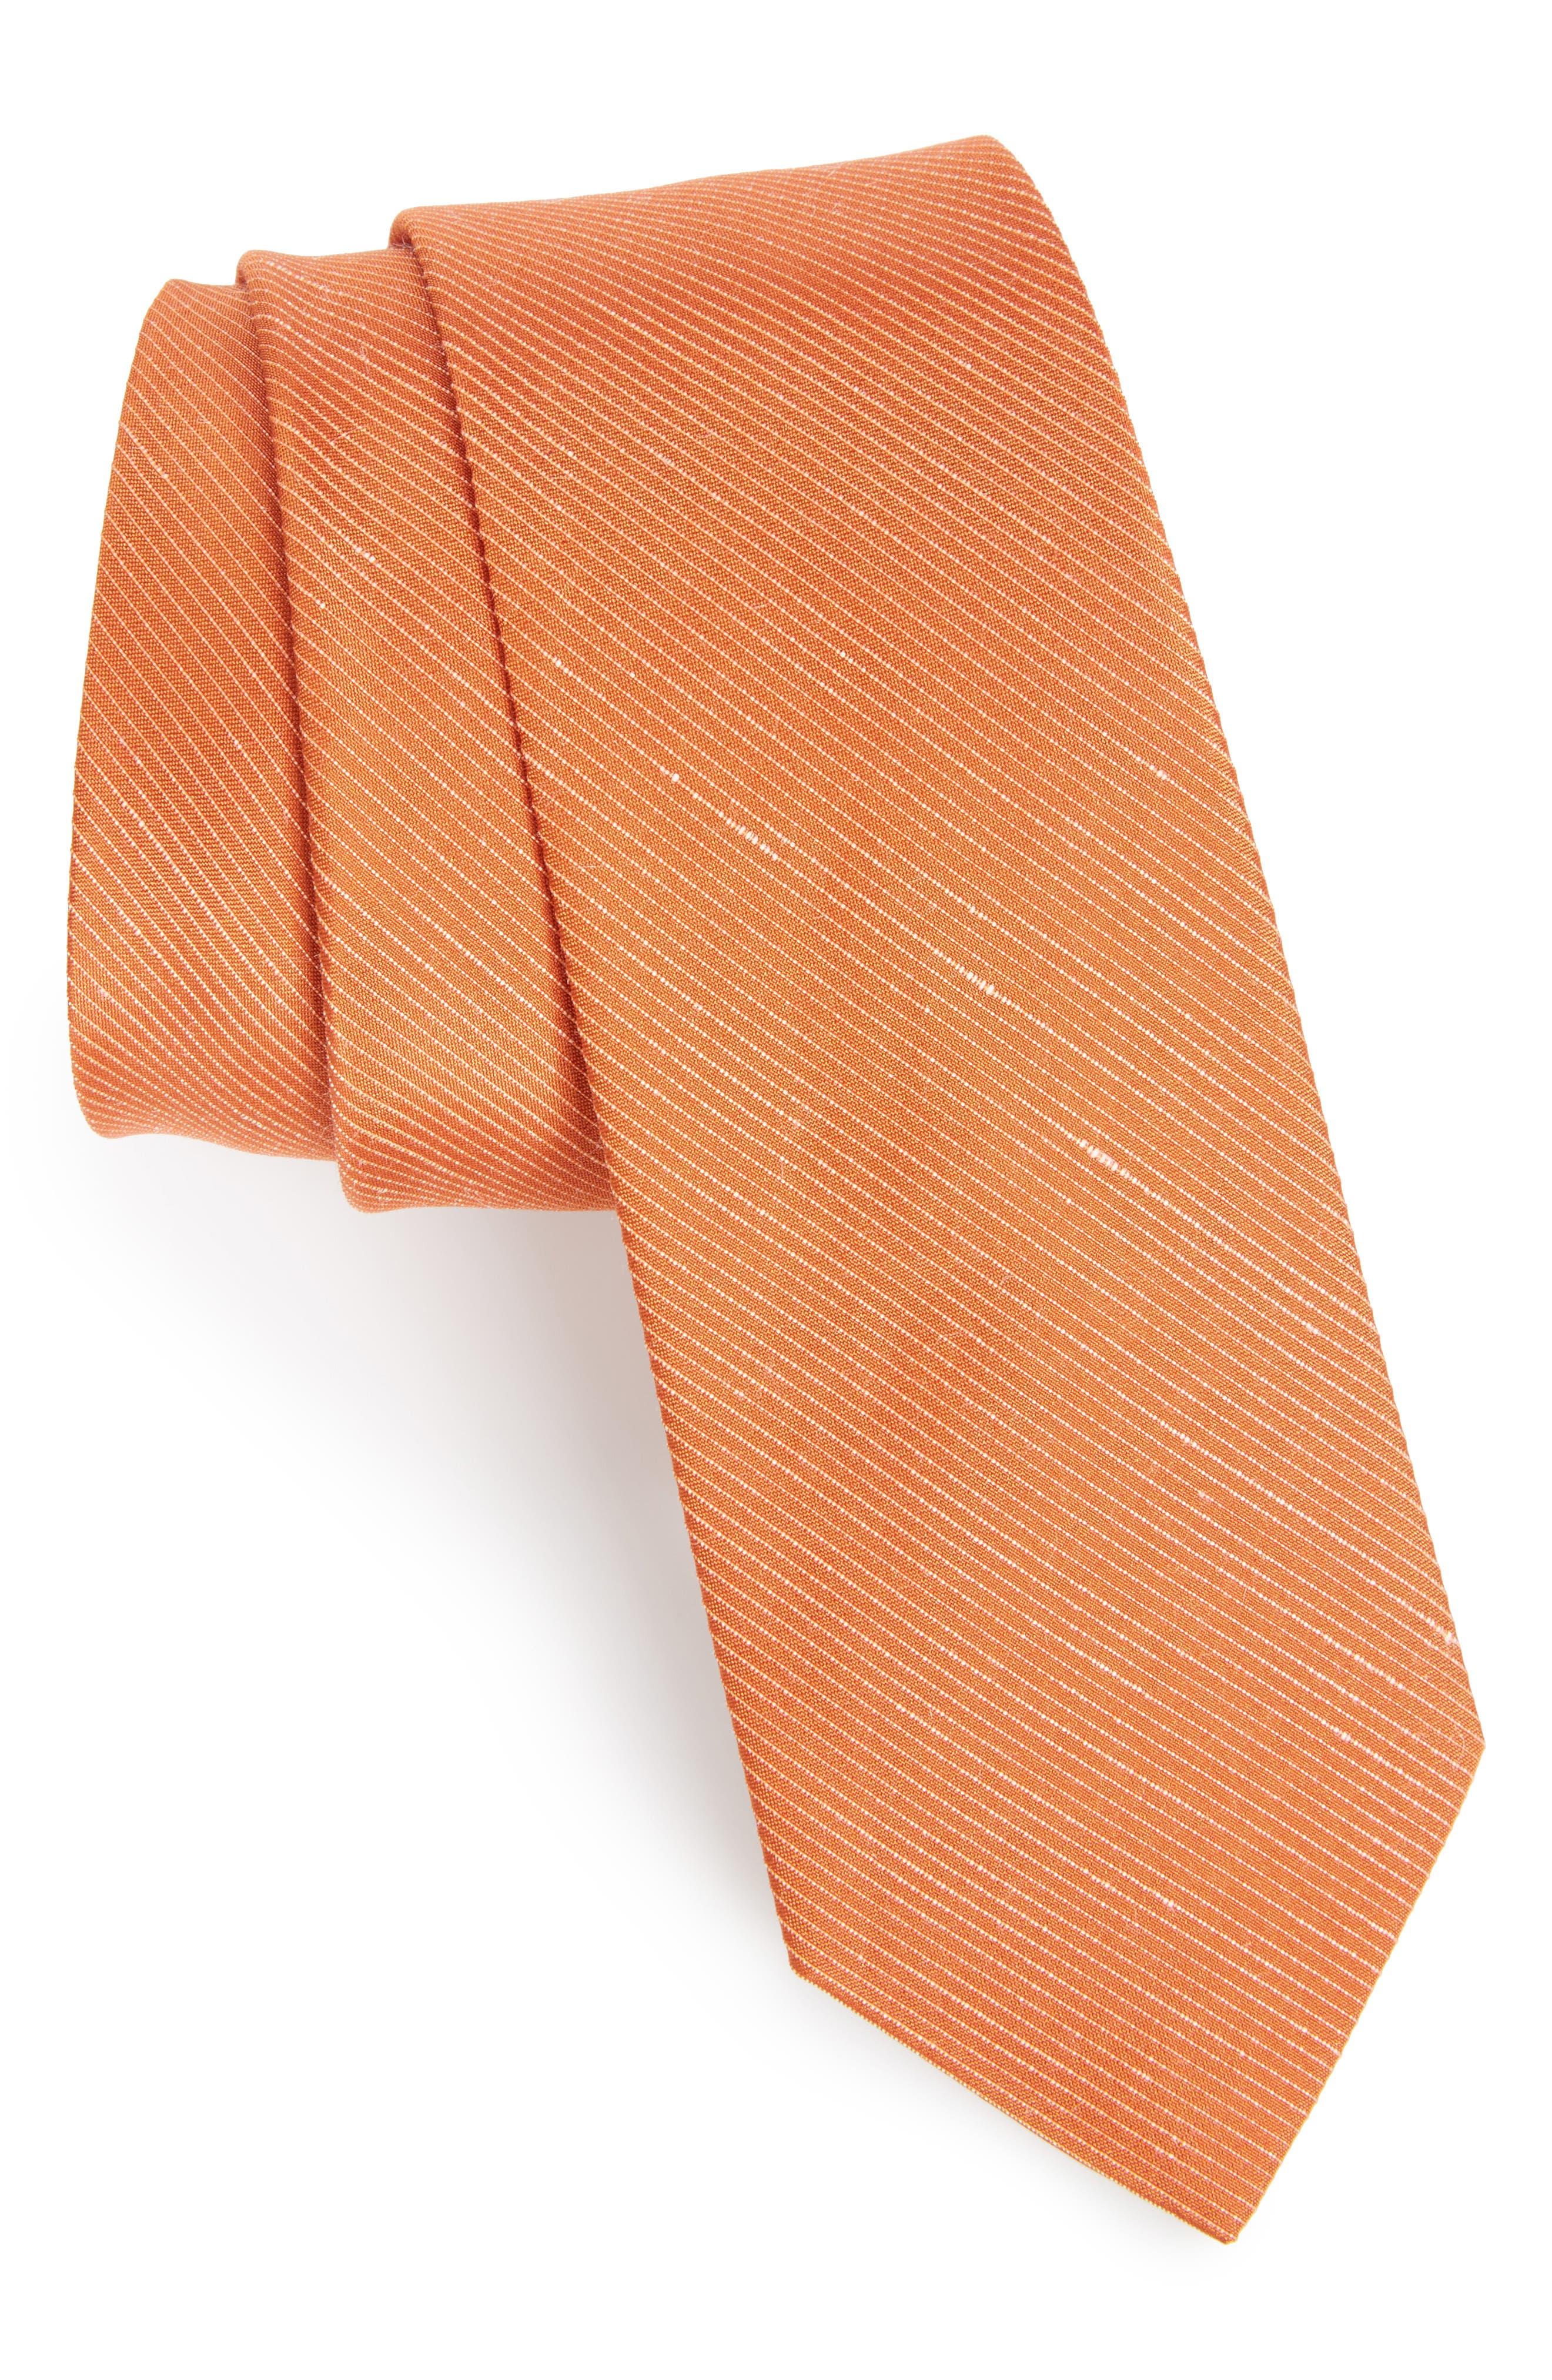 Alternate Image 1 Selected - The Tie Bar Pinstripe Silk & Linen Tie